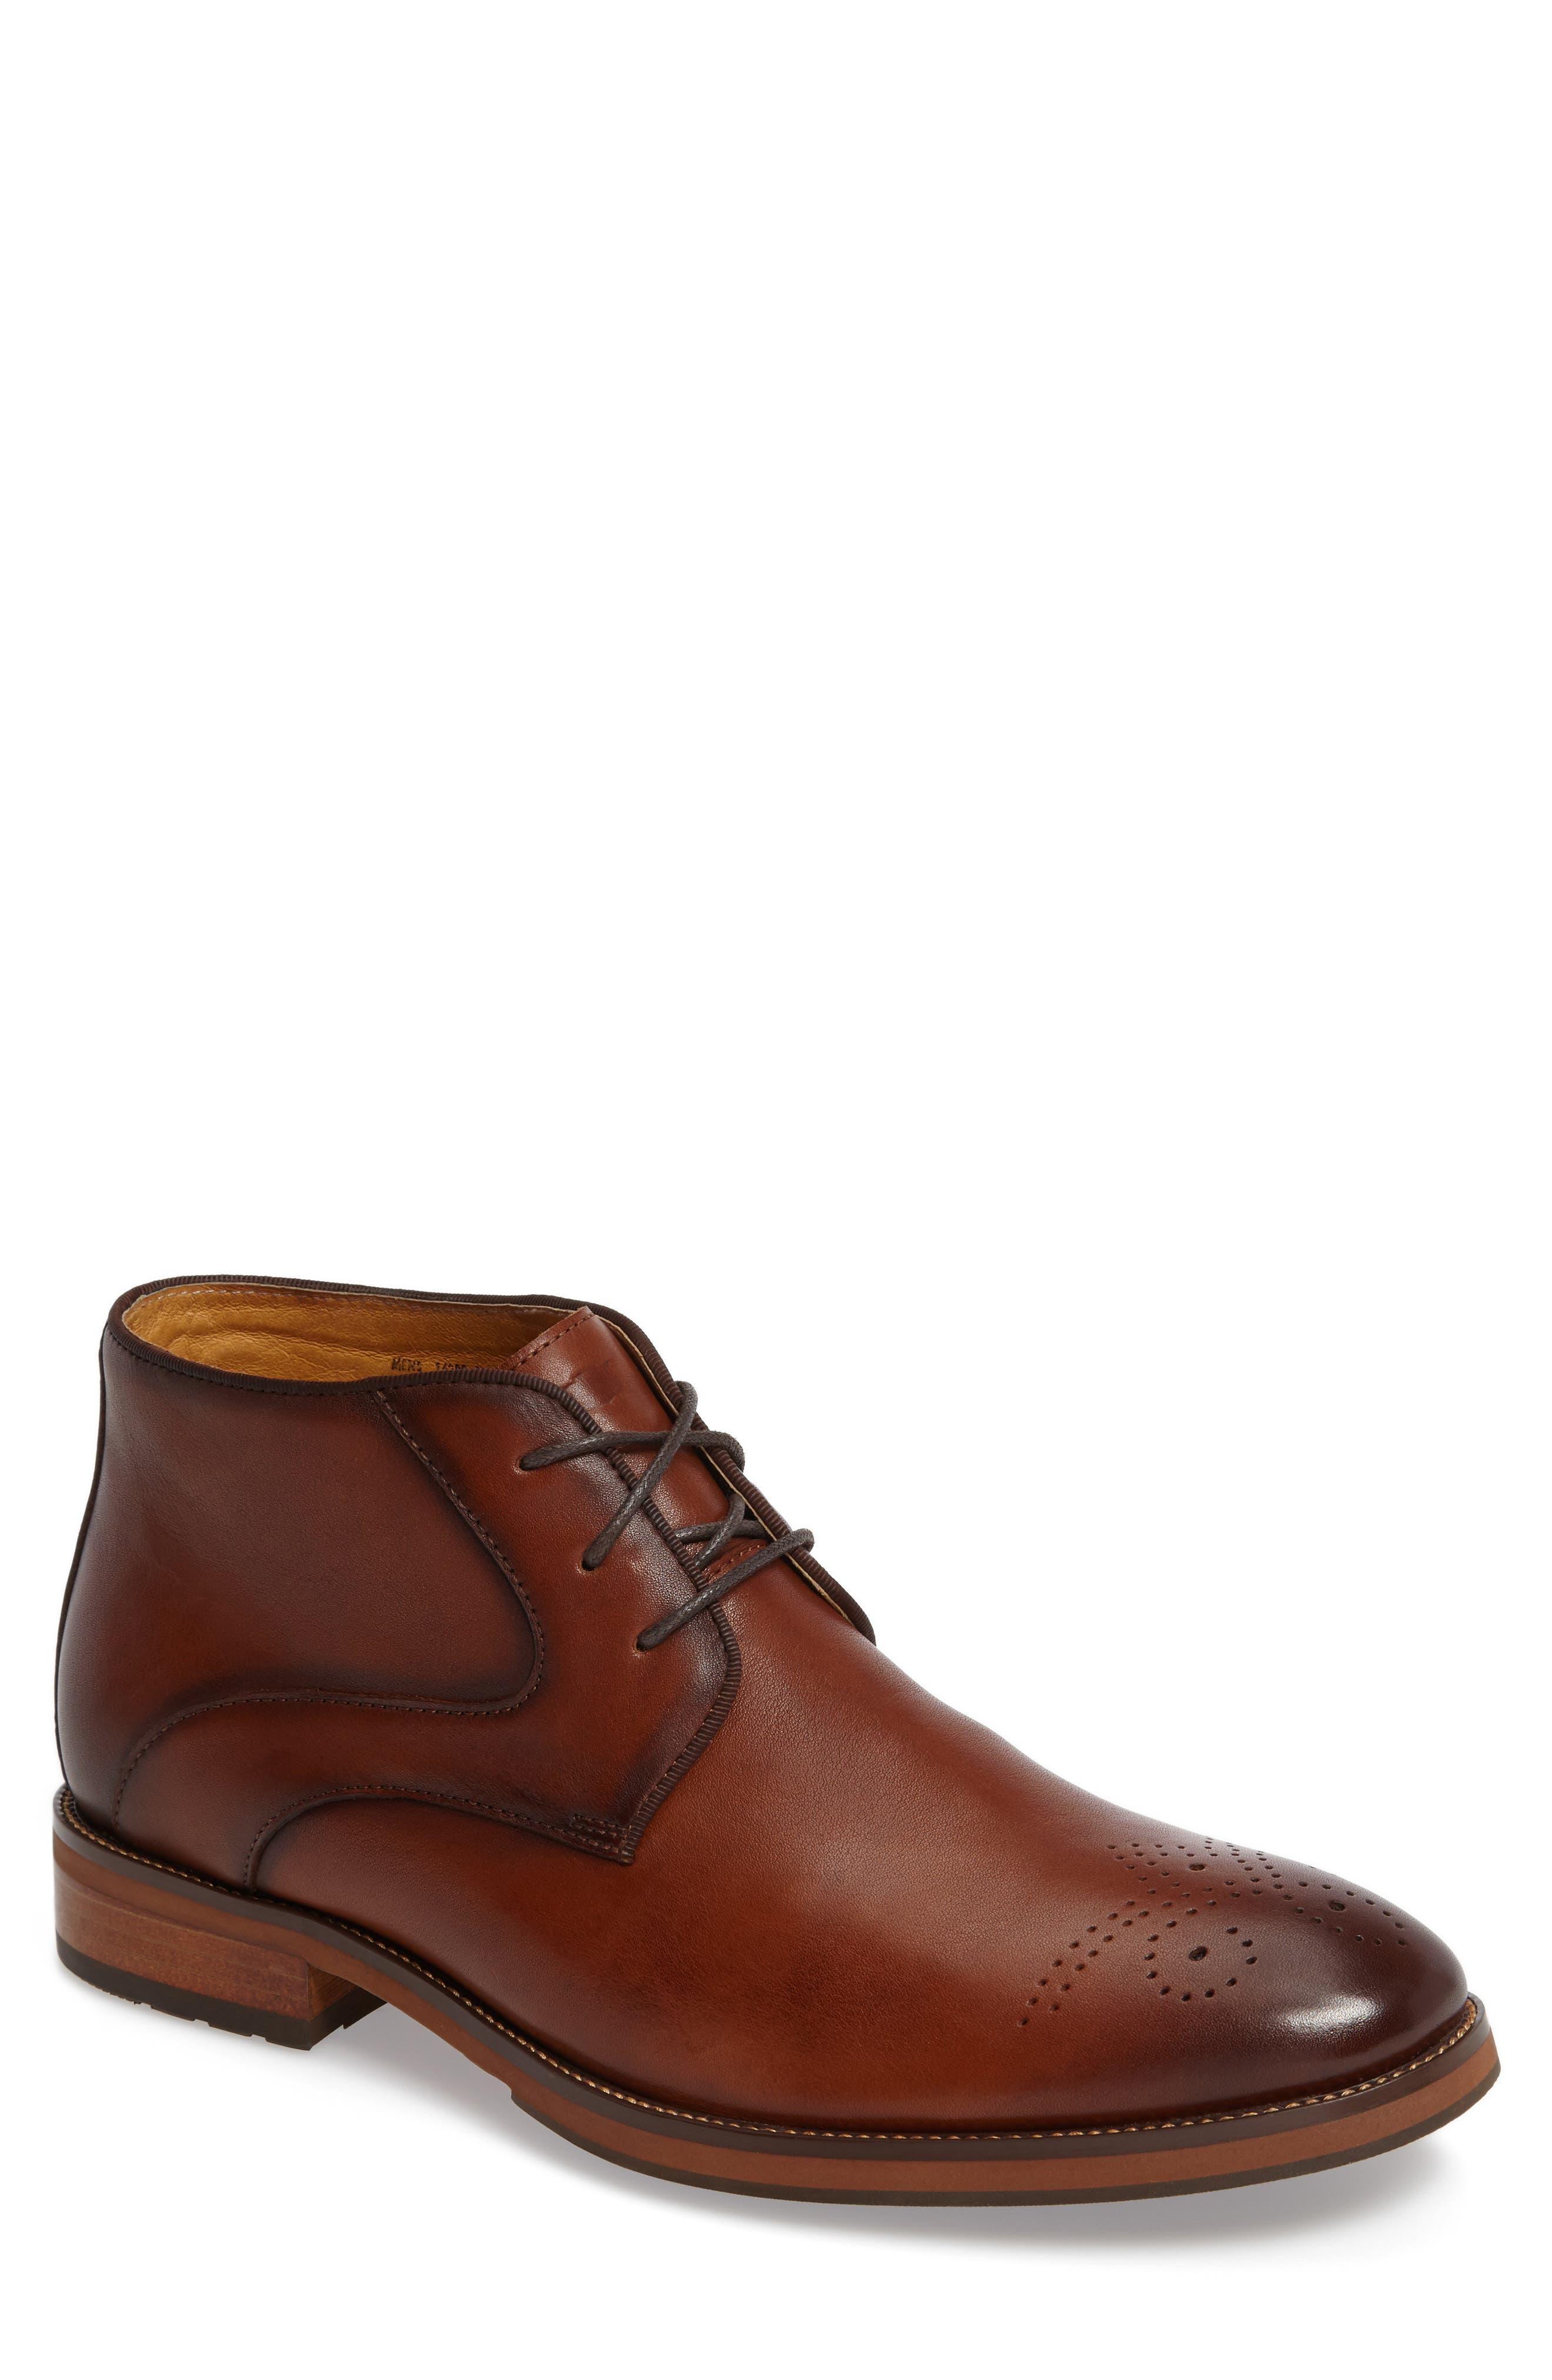 Blaze Chukka Boot,                             Main thumbnail 1, color,                             Cognac Leather